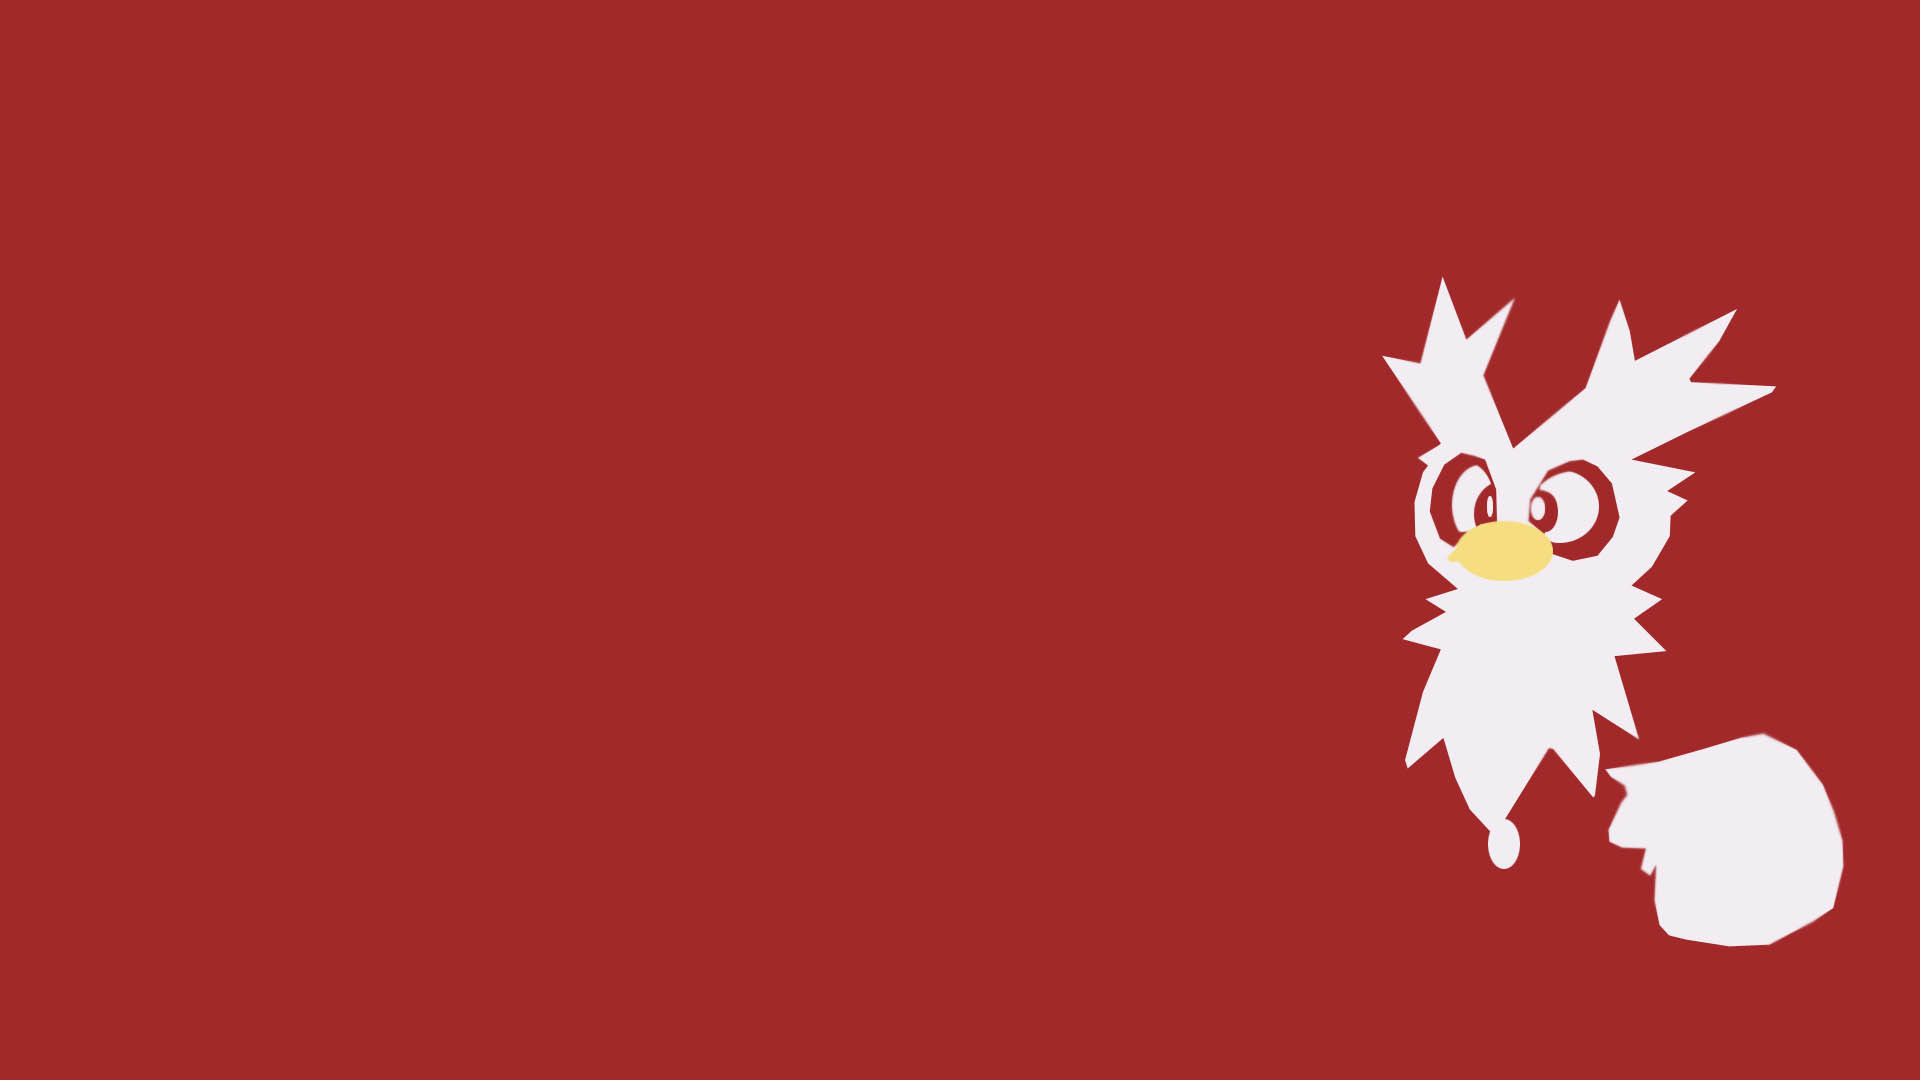 Simple Pokemon Backgrounds